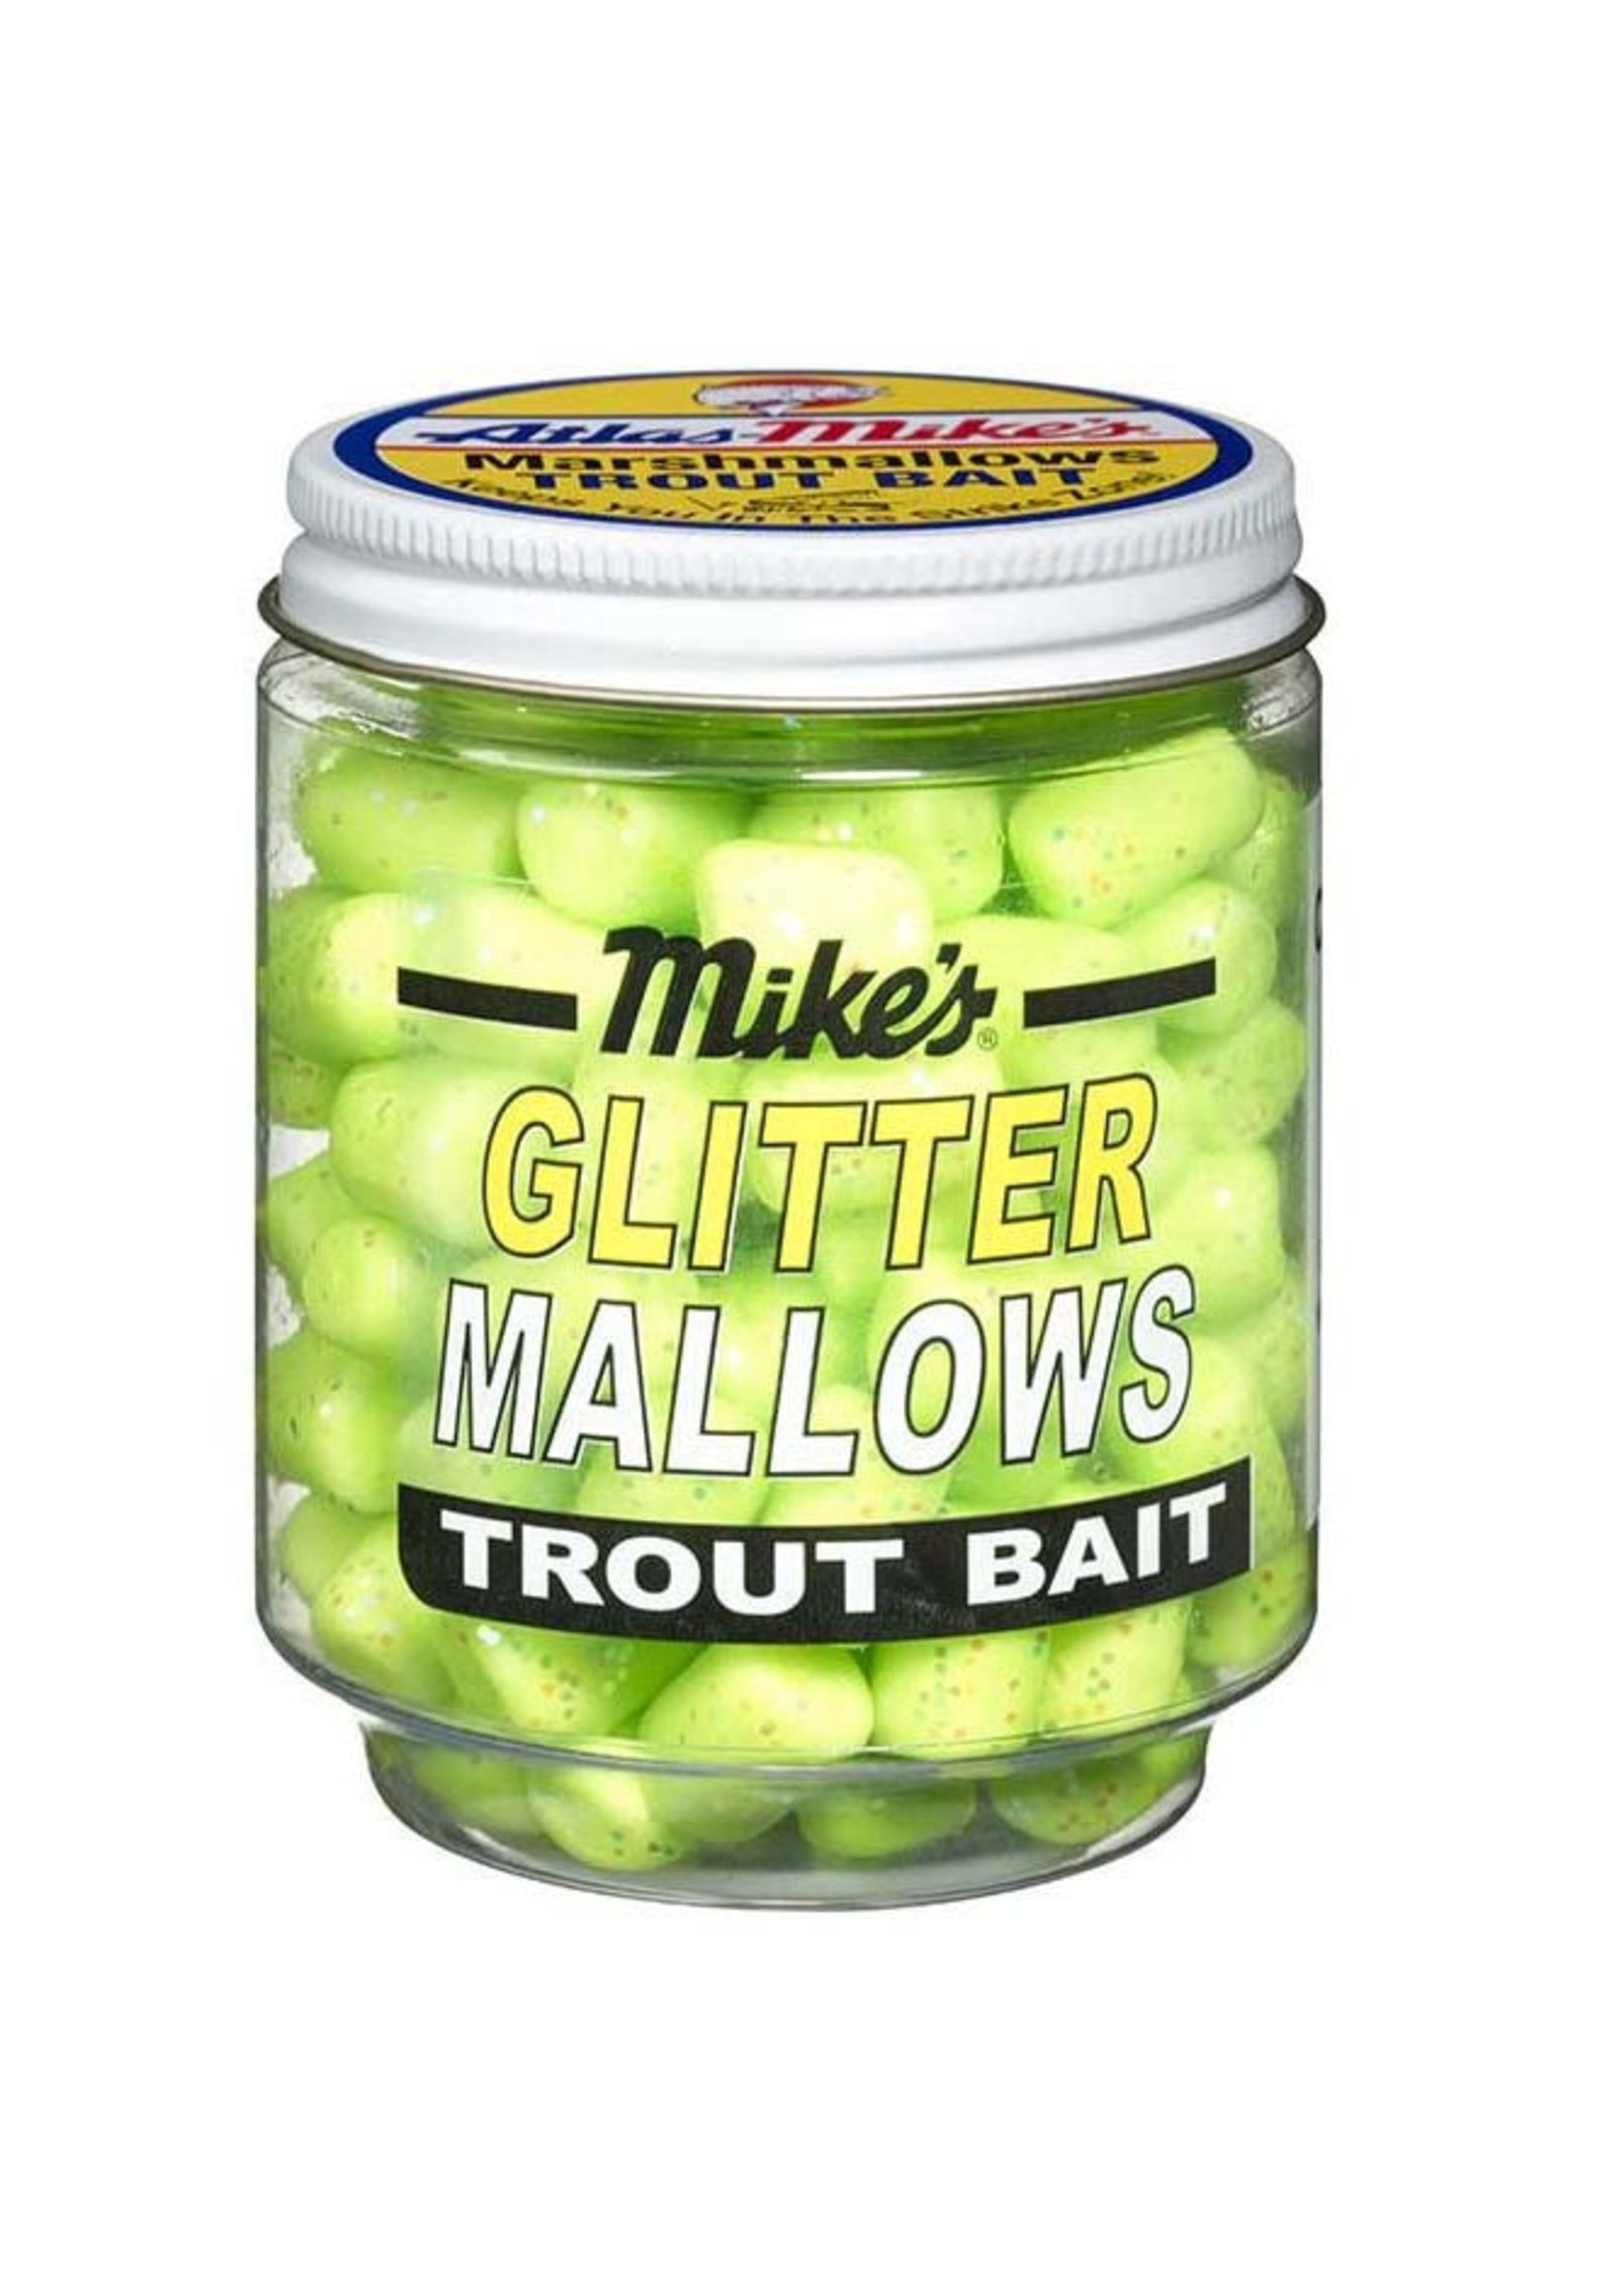 Atlas-Mike's Atlas-Mike's 32039 Glitter Mallows Chartreuse/Garlic 1.5oz Jar